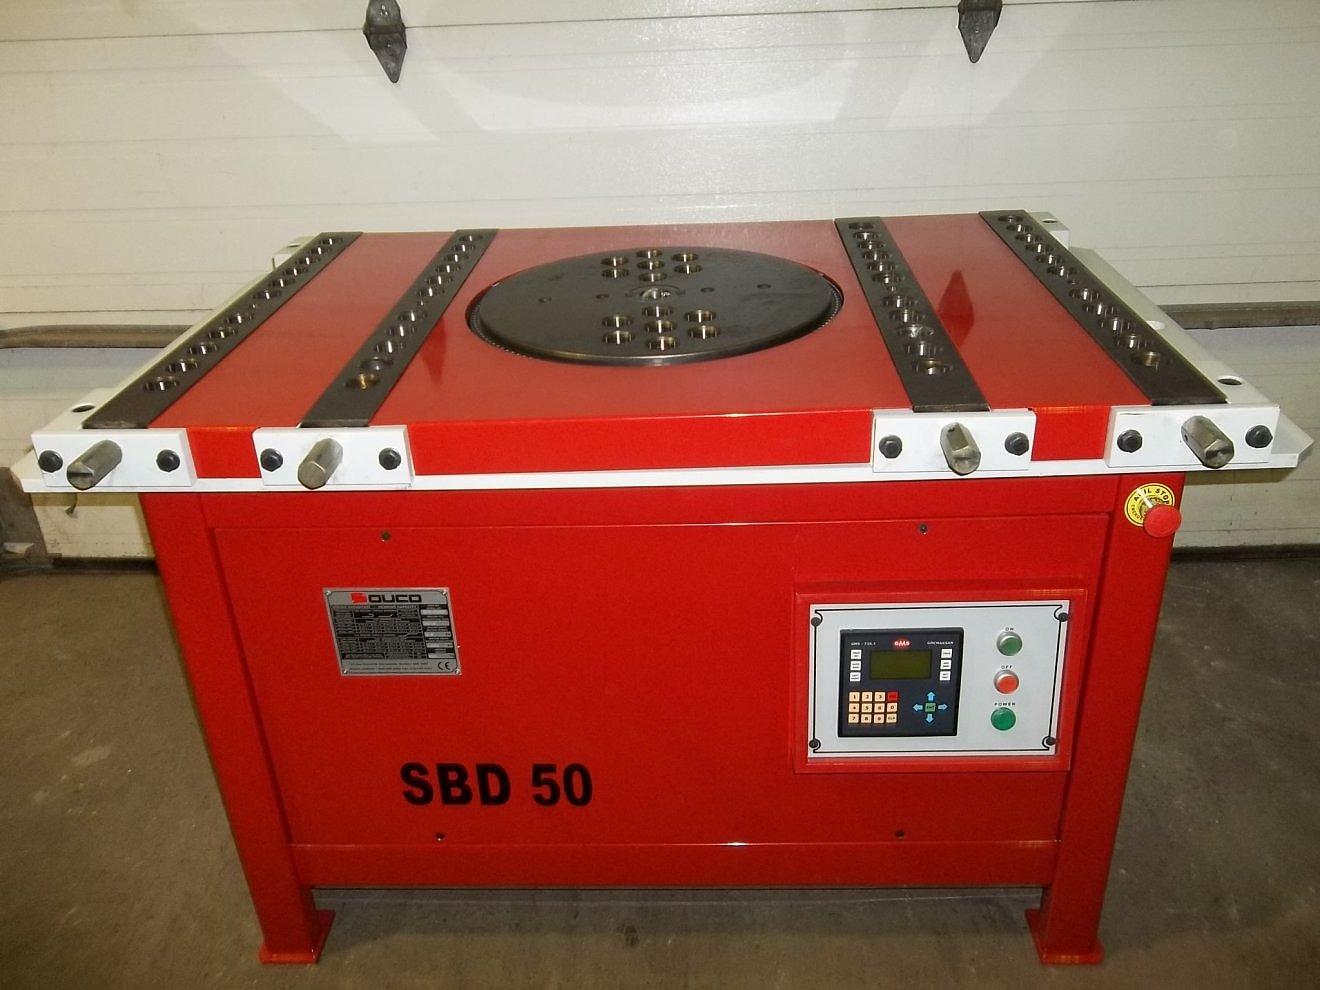 Sbd 50